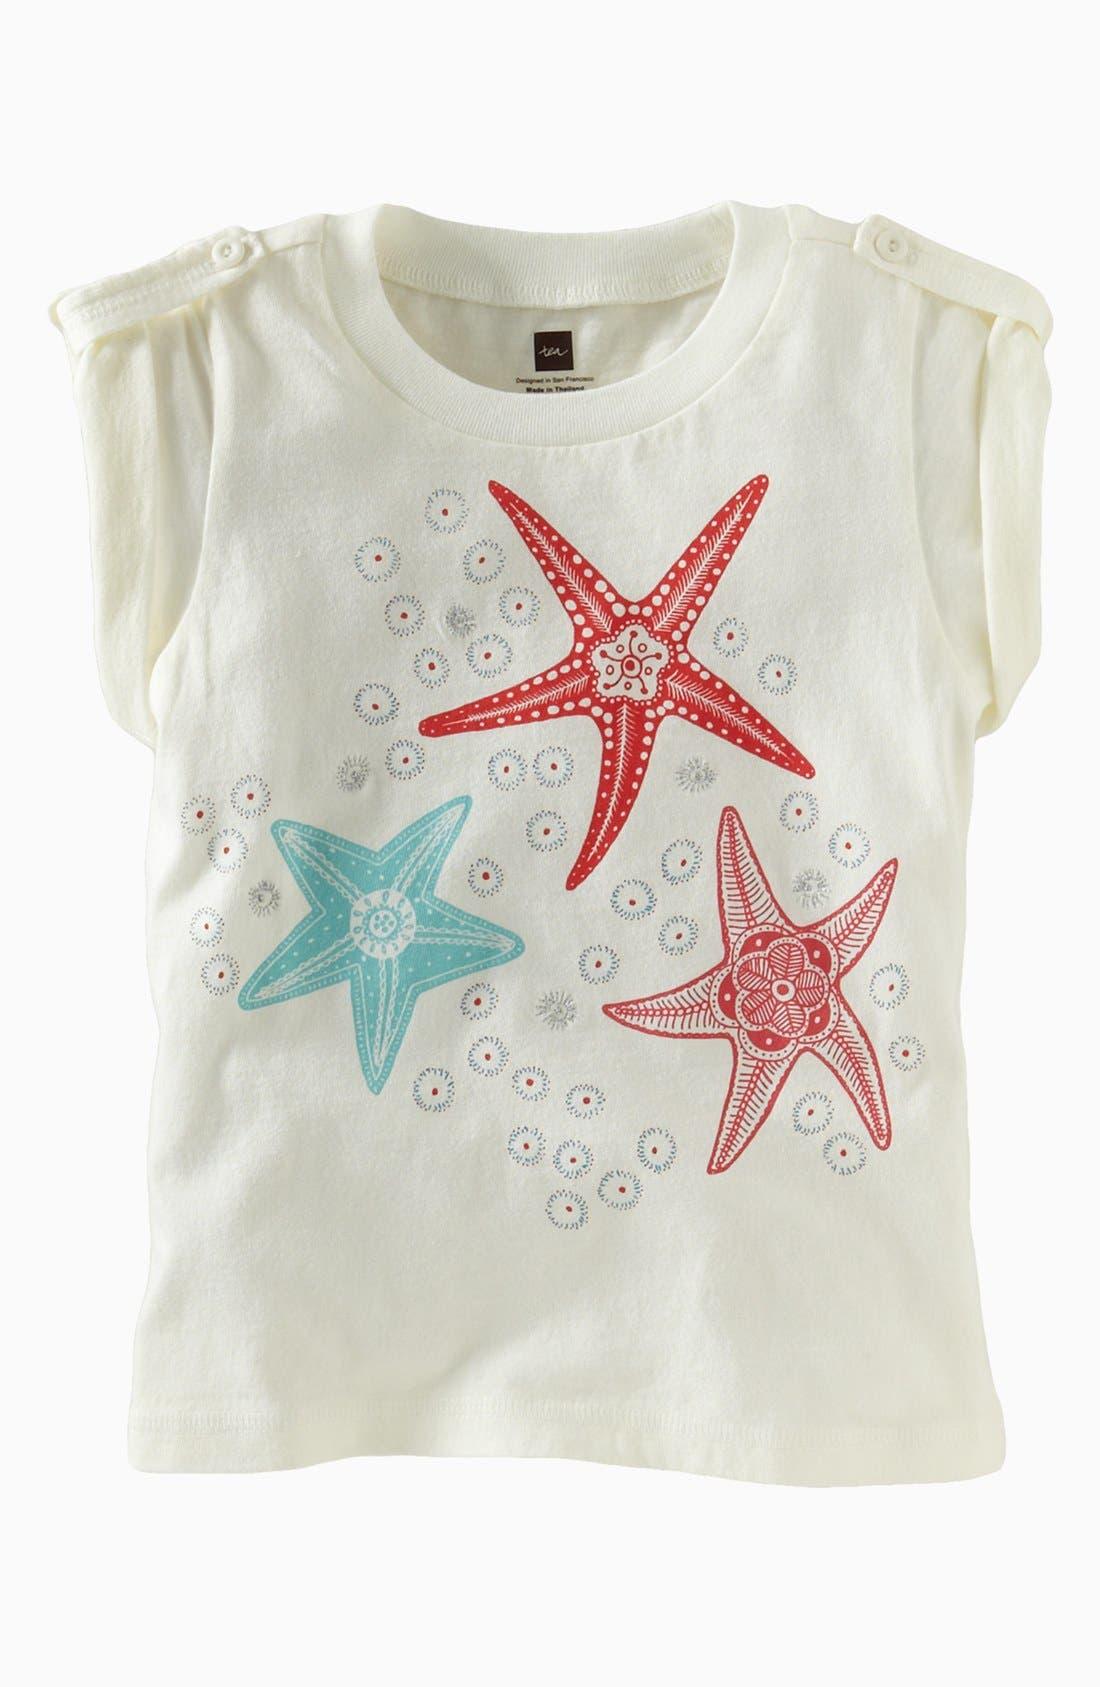 Main Image - Tea Collection 'Sea Star' Tee (Little Girls & Big Girls)